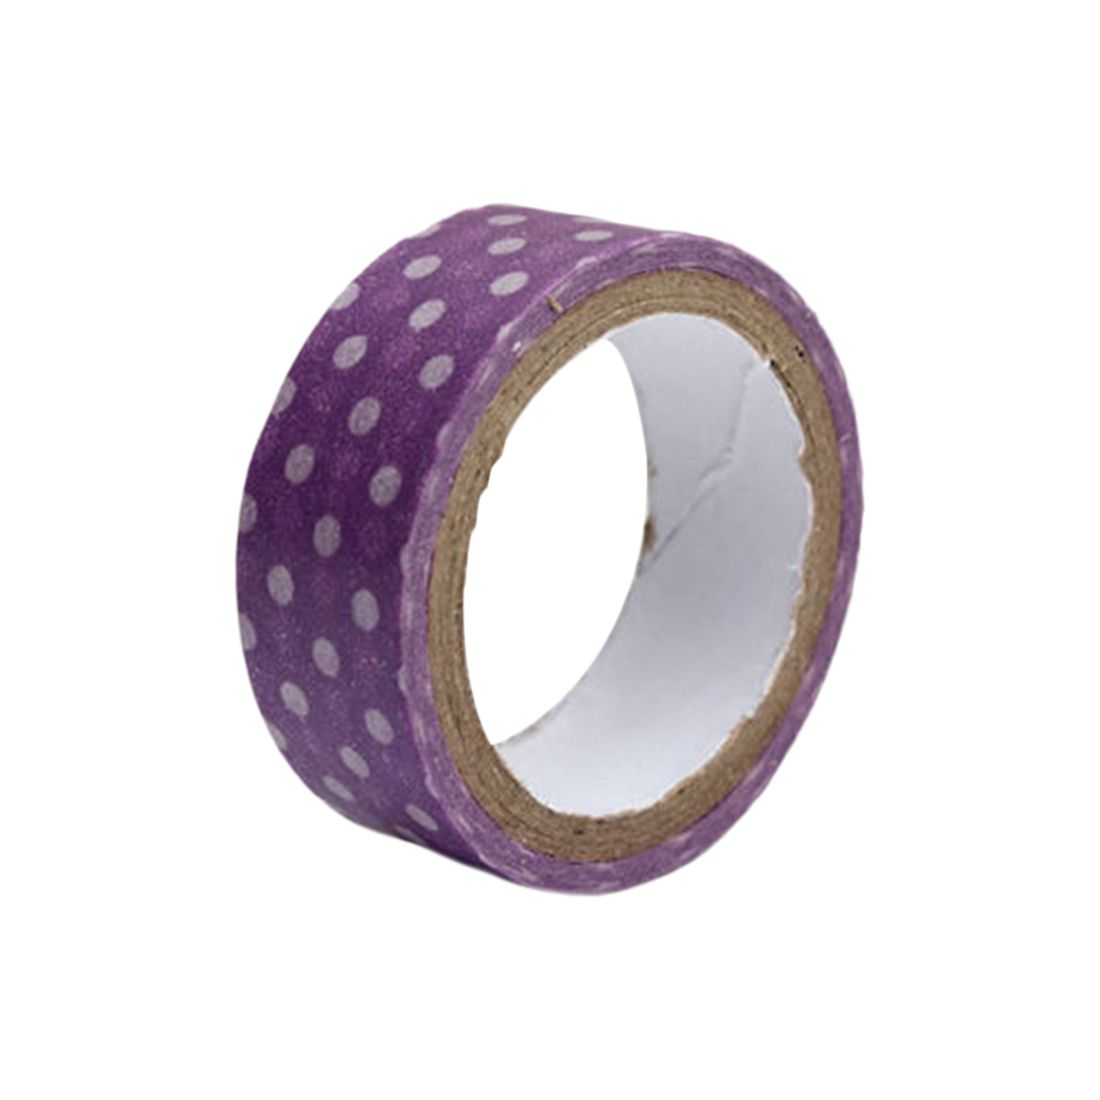 BLEL Hot 15mm Dot Print Washi DIY Masking Paper Roll Tape Decorative Adhesive Sticker ColorPurple